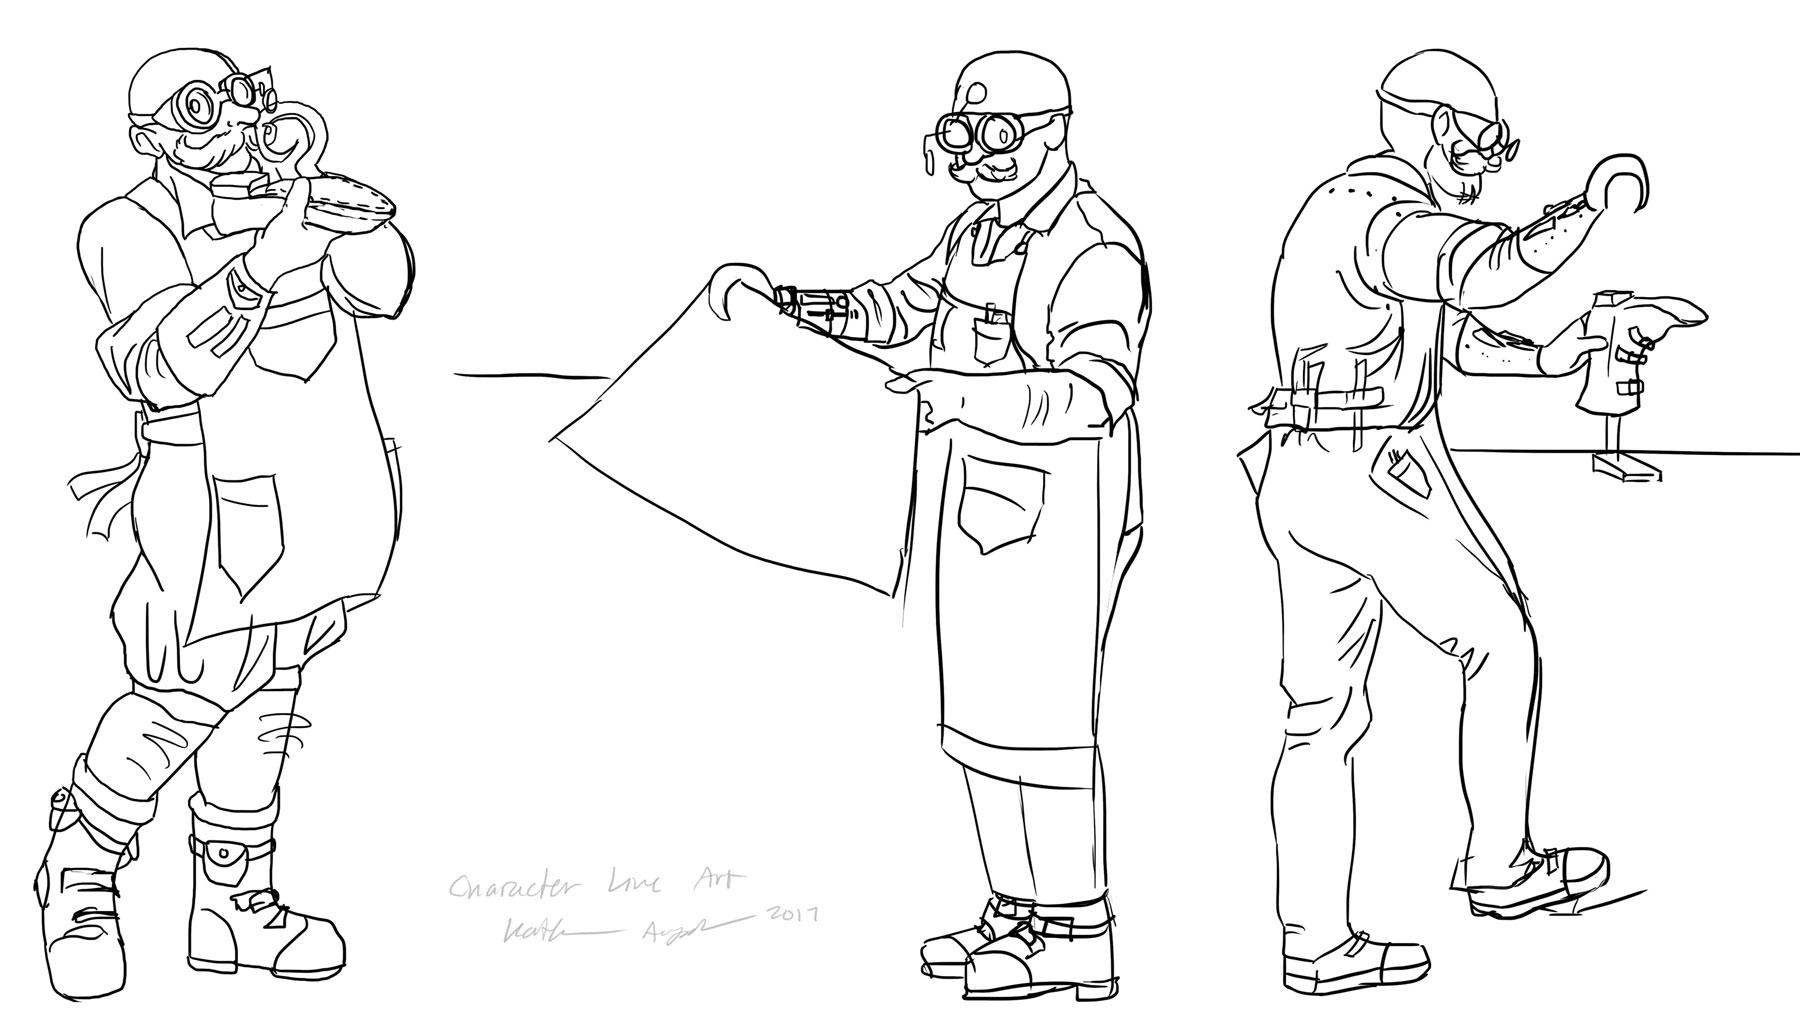 Character Line Art - Shoemaker